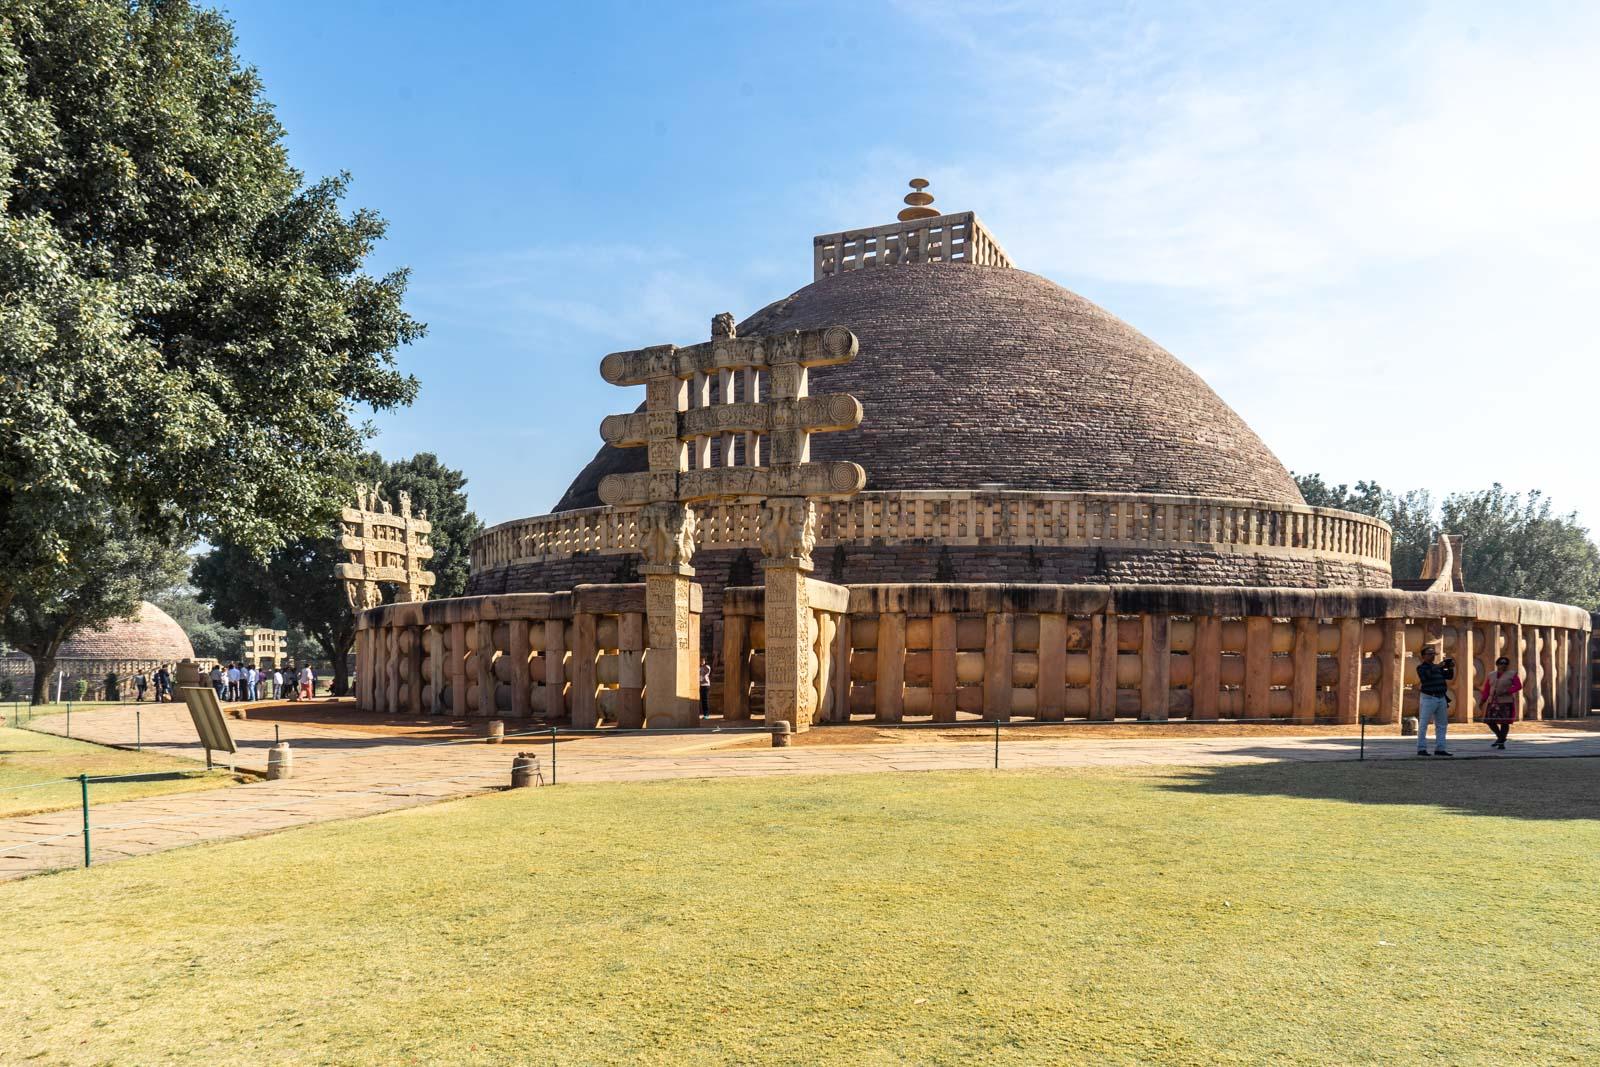 The Great Stupa at Sanchi, Madhya Pradesh, India